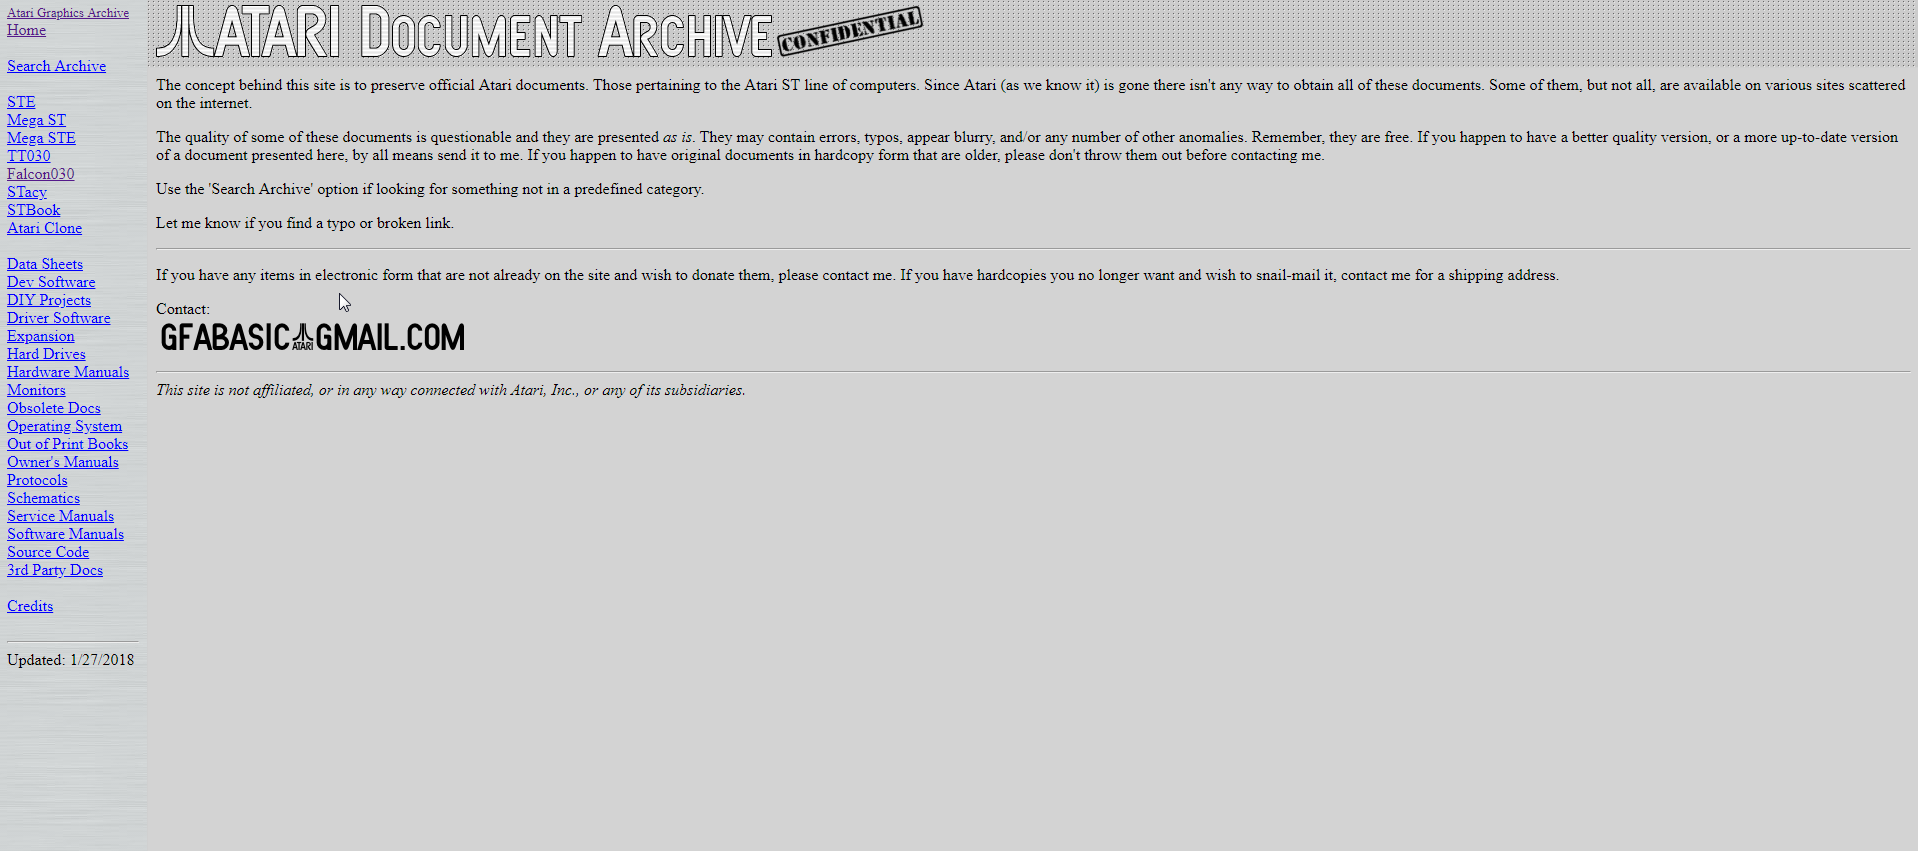 Screenshot of website Atari Documentation Archive